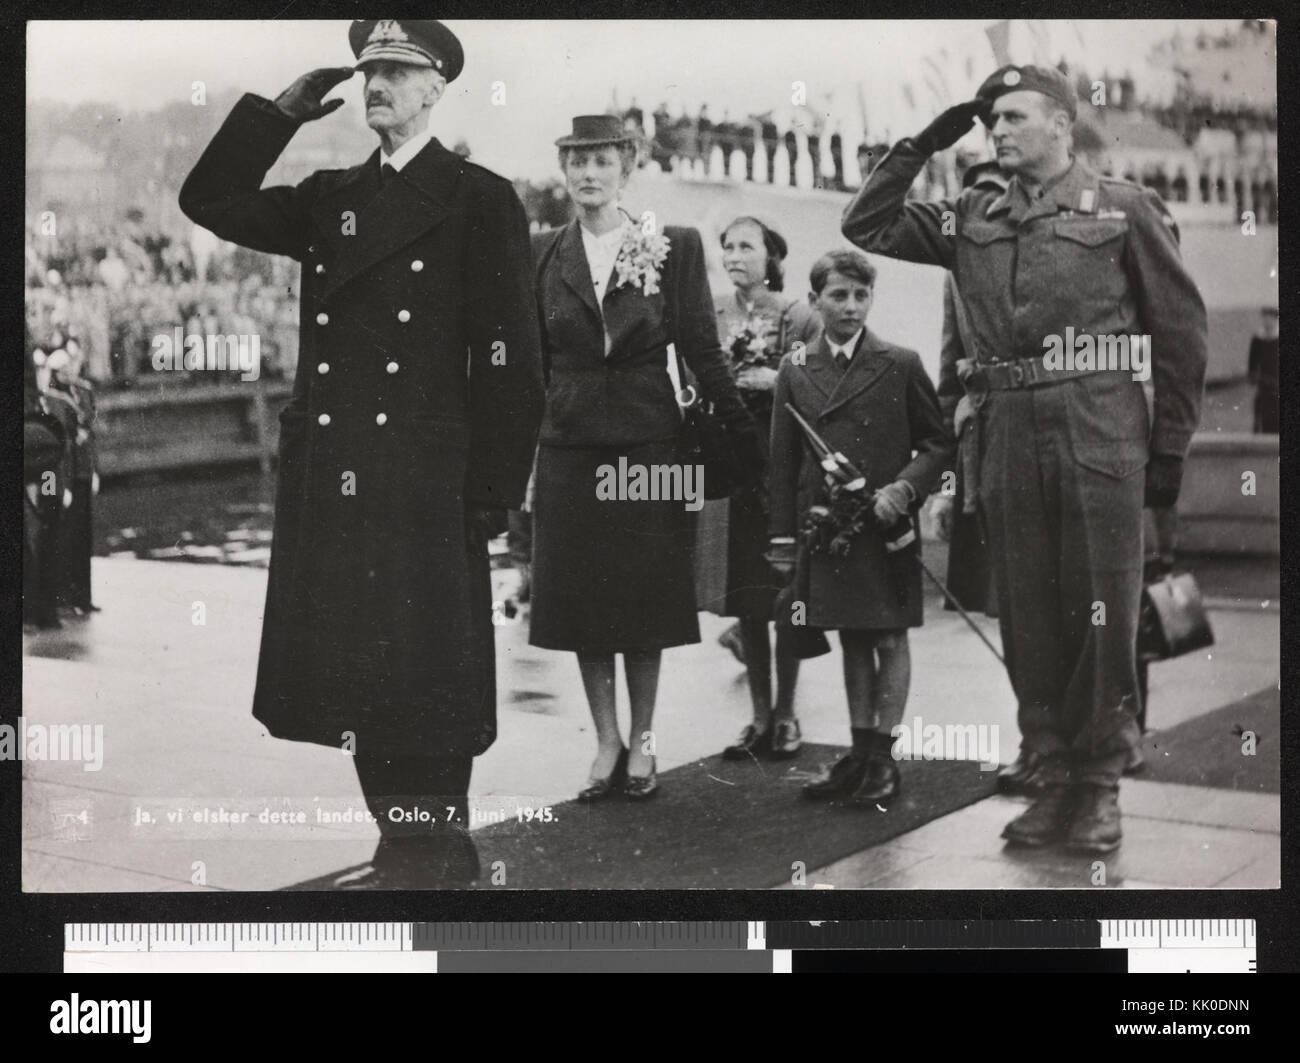 4. Ja, vi elsker dette landet. Oslo, 7. juin 1945 nb digifoto bldsa 2016011800020 kgl pk0079 Photo Stock